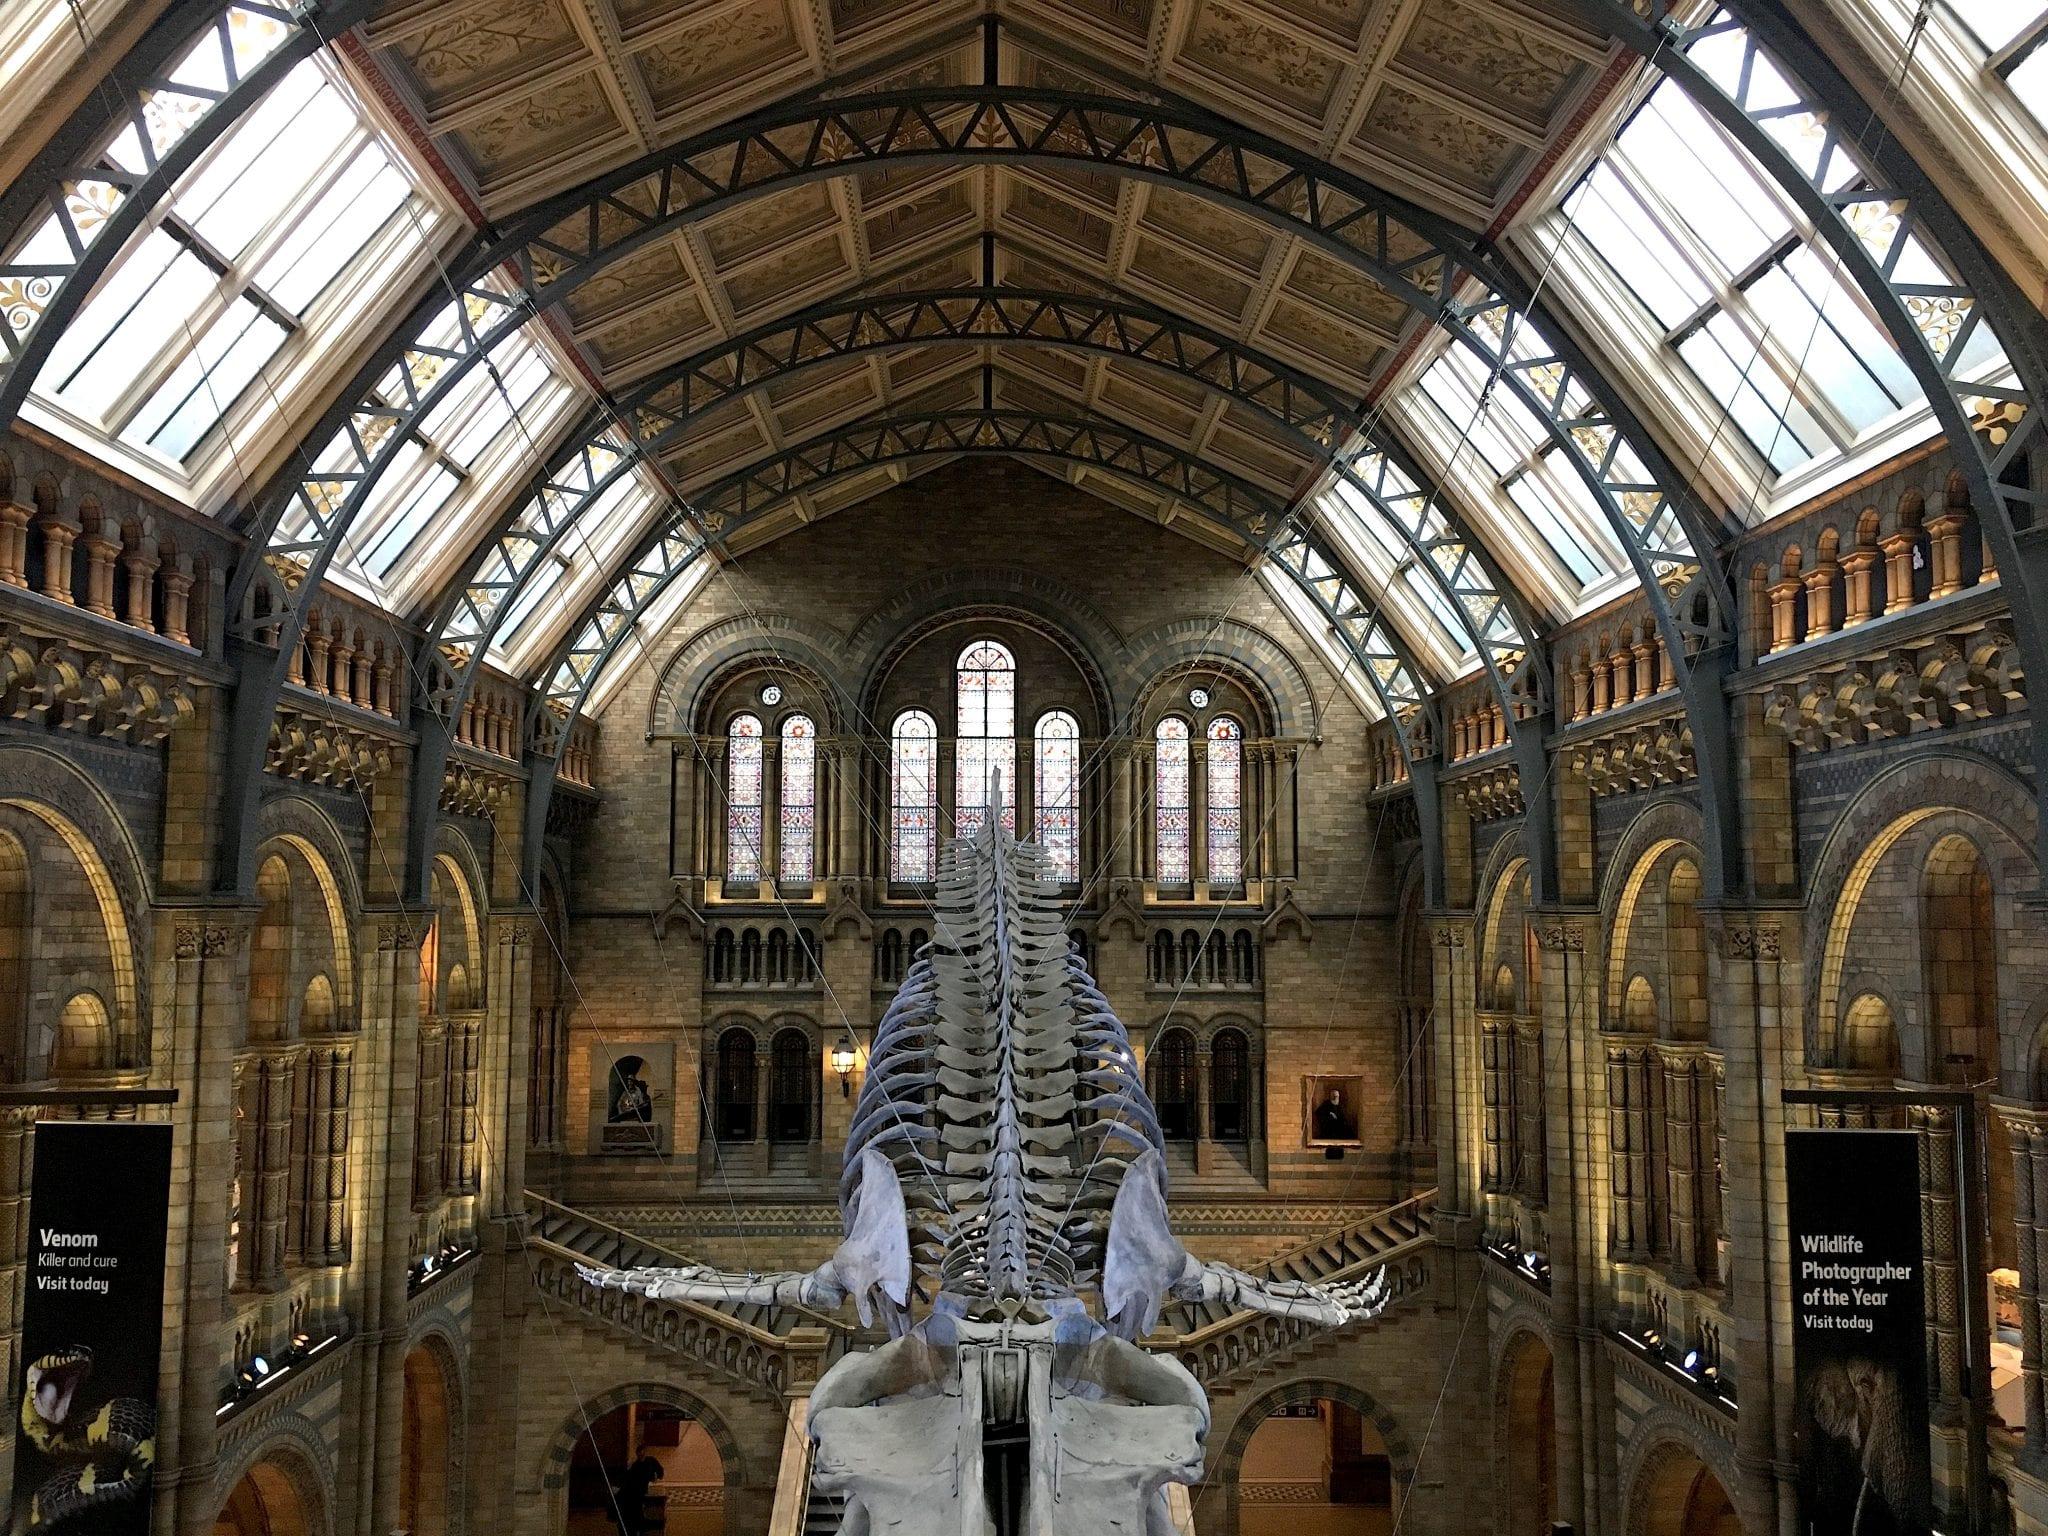 natural history museum - Prima volta a Londra - Le Plume